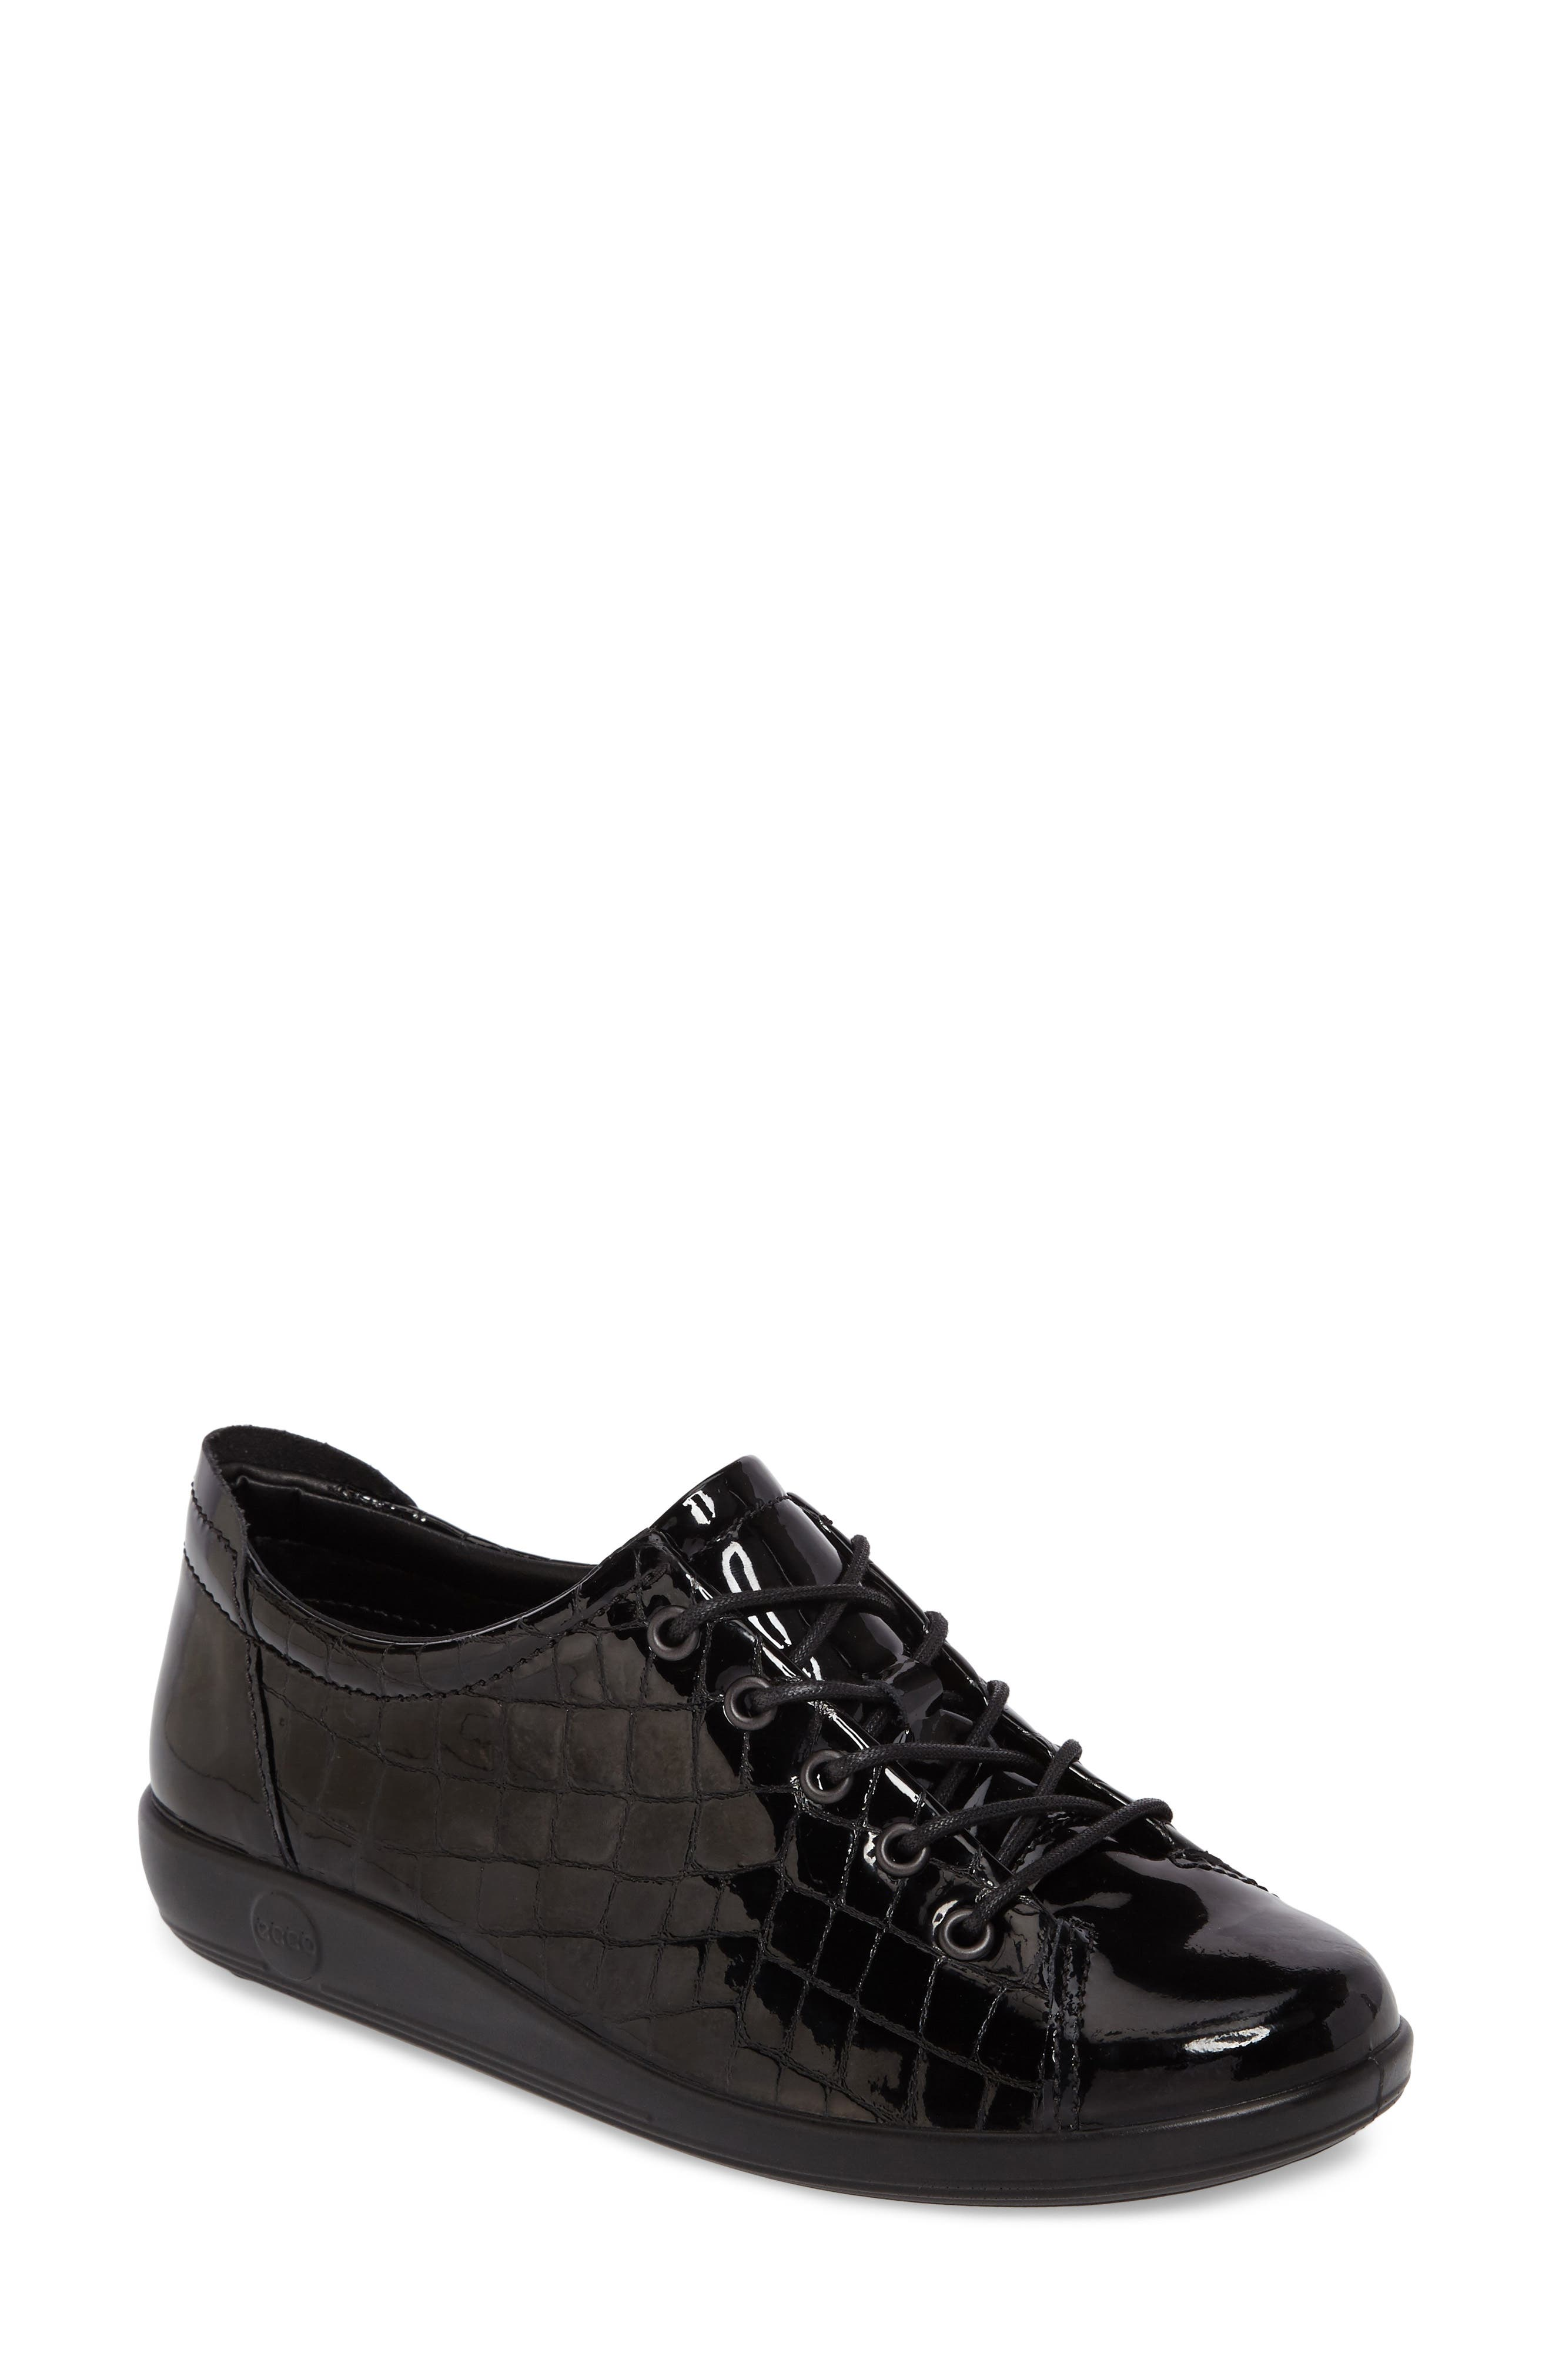 'Soft 2.0' Sneaker,                         Main,                         color, 019